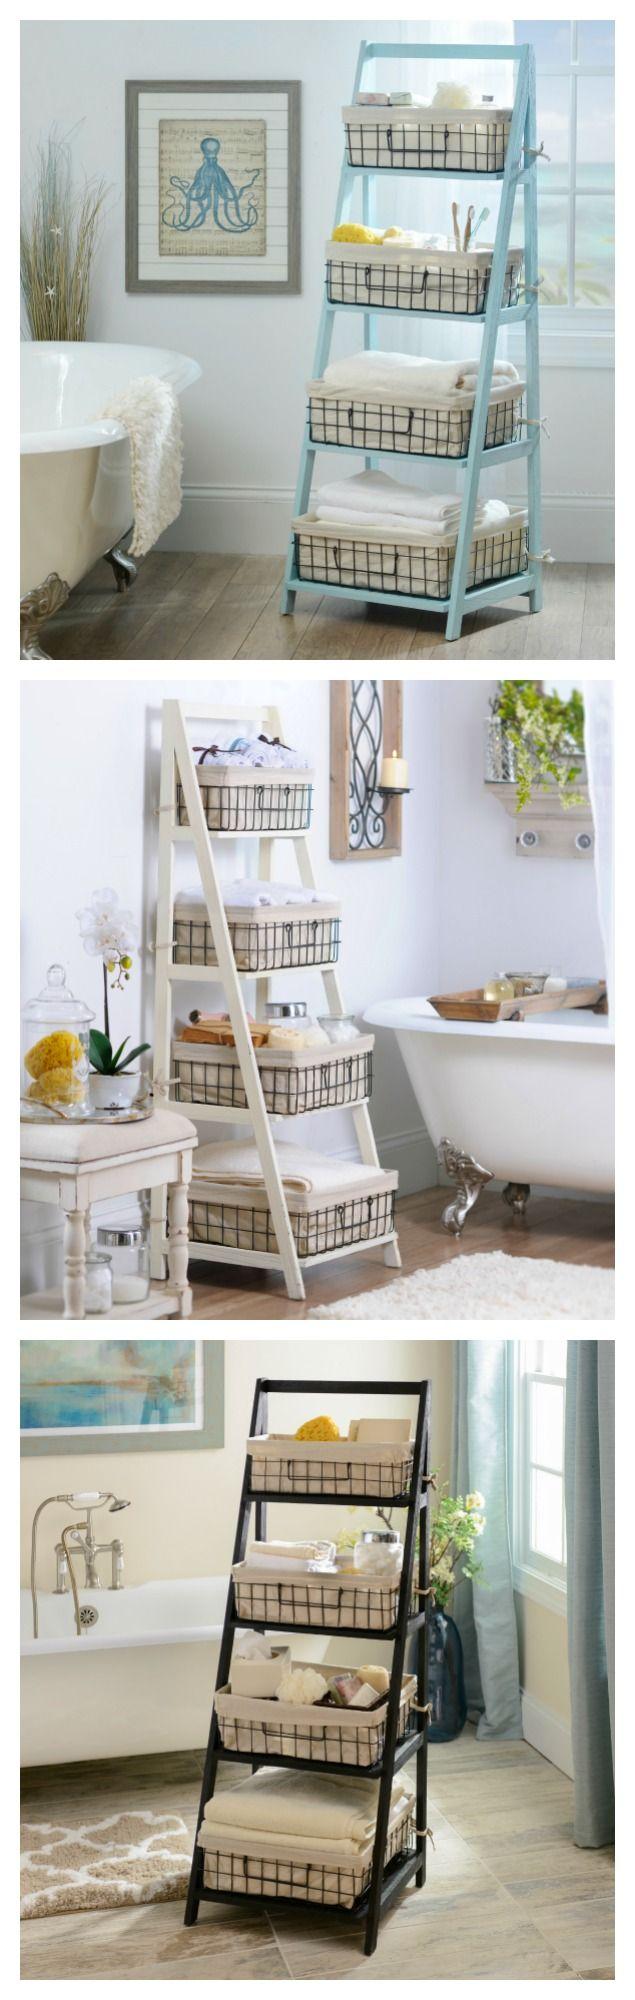 best 25+ bathroom towel storage ideas on pinterest   storage in